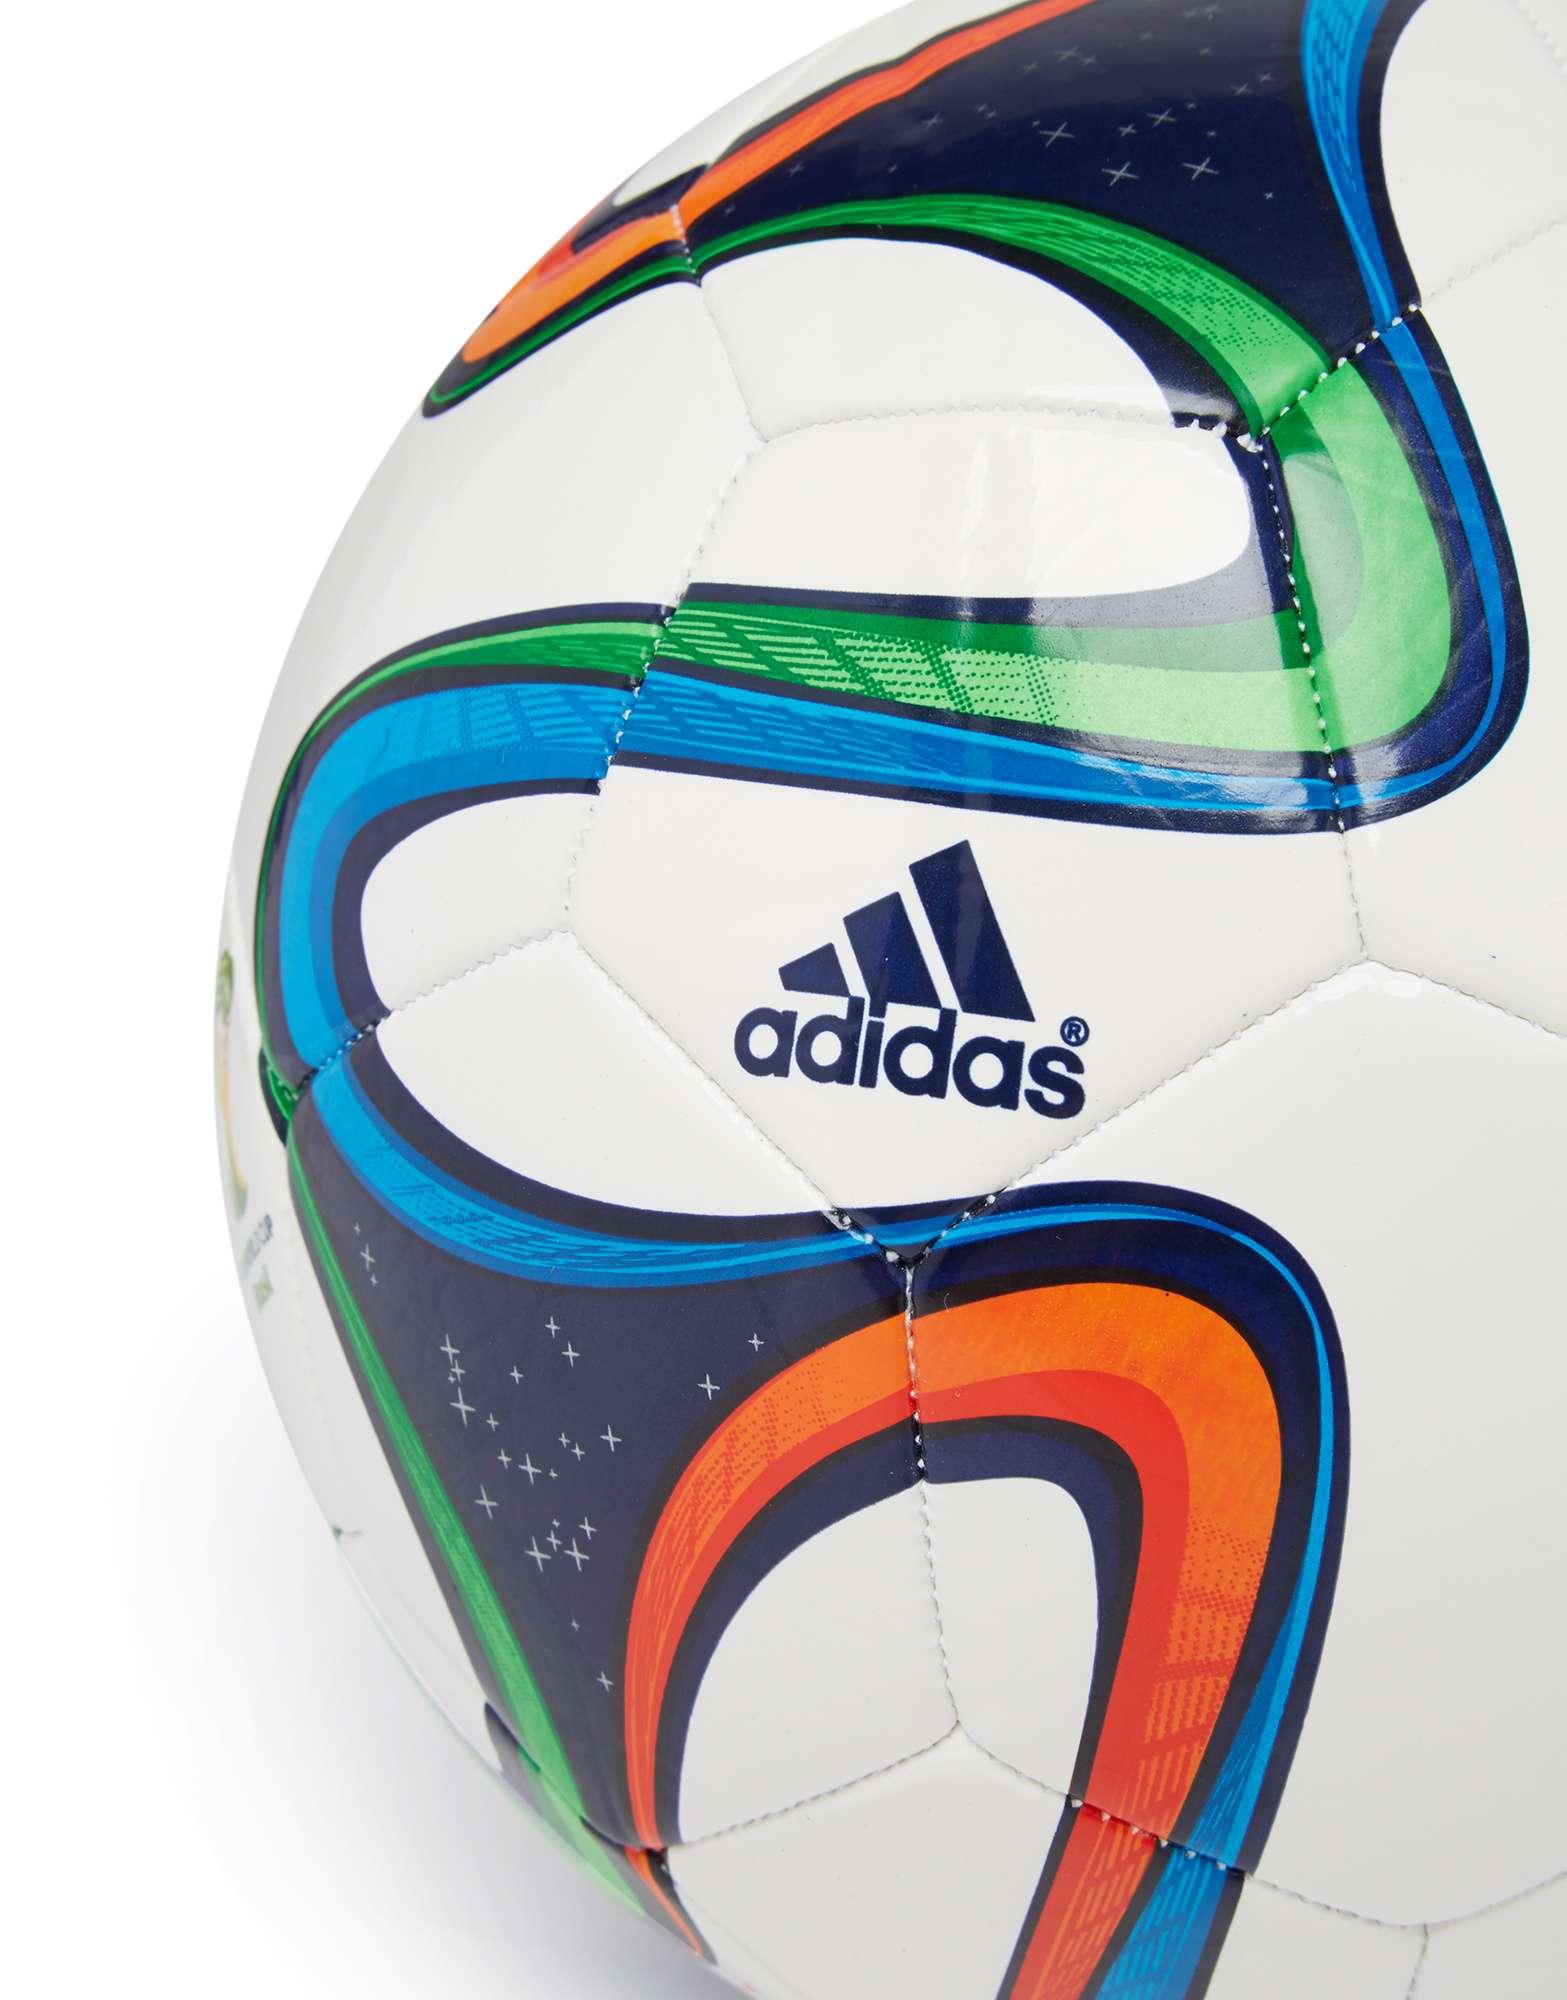 adidas Brazuca Glider FIFA World Cup 2014 Ball